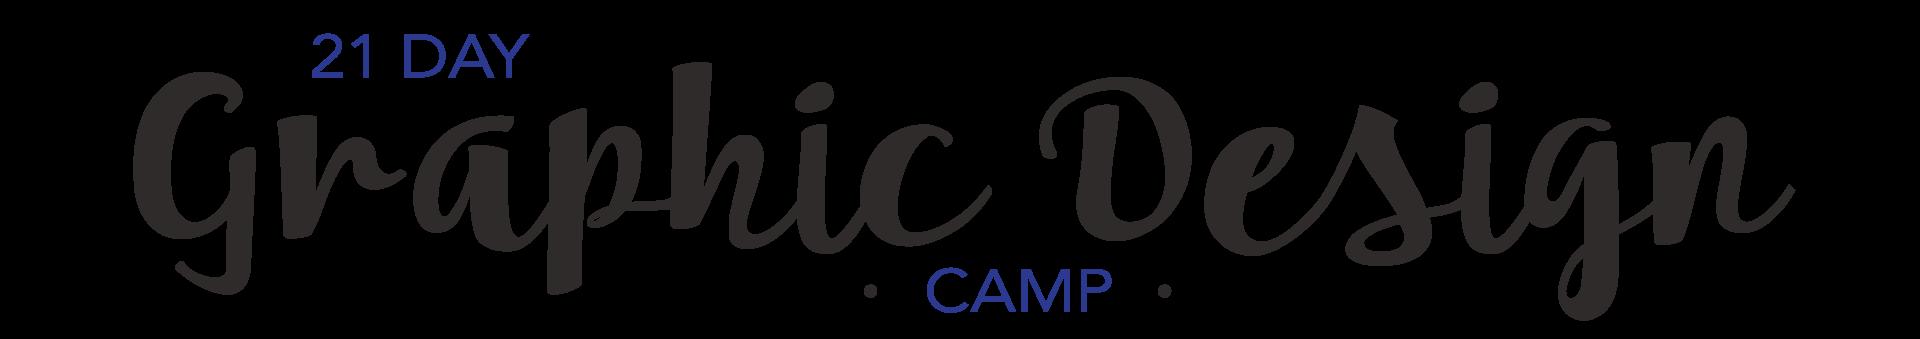 21 Day Graphic Design Camp